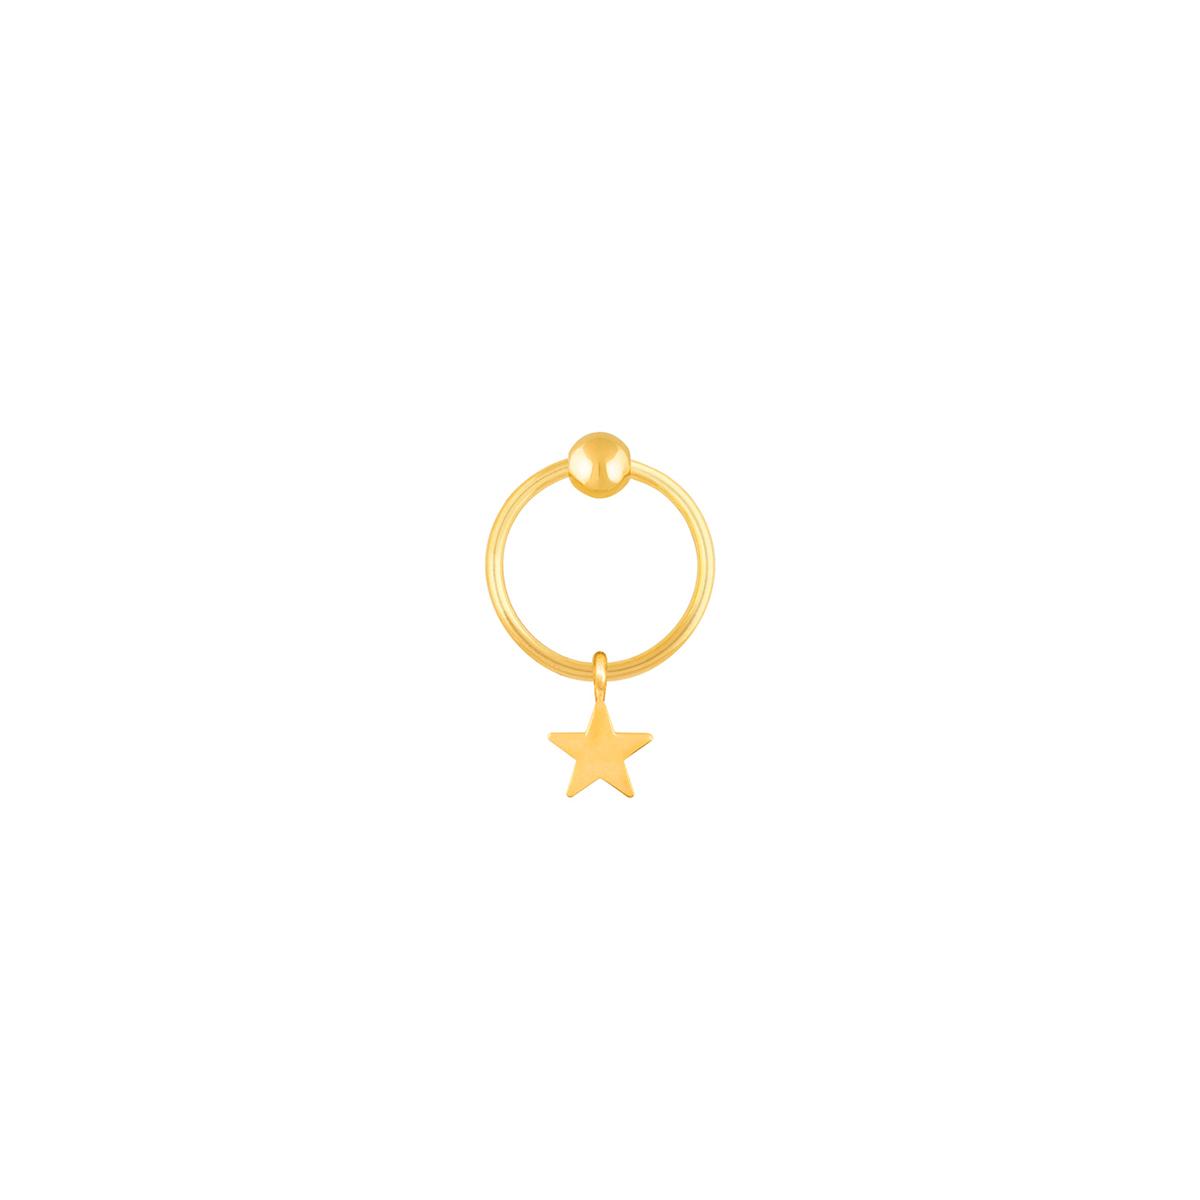 گوشواره طلا تک لنگه ای ستاره و گوی